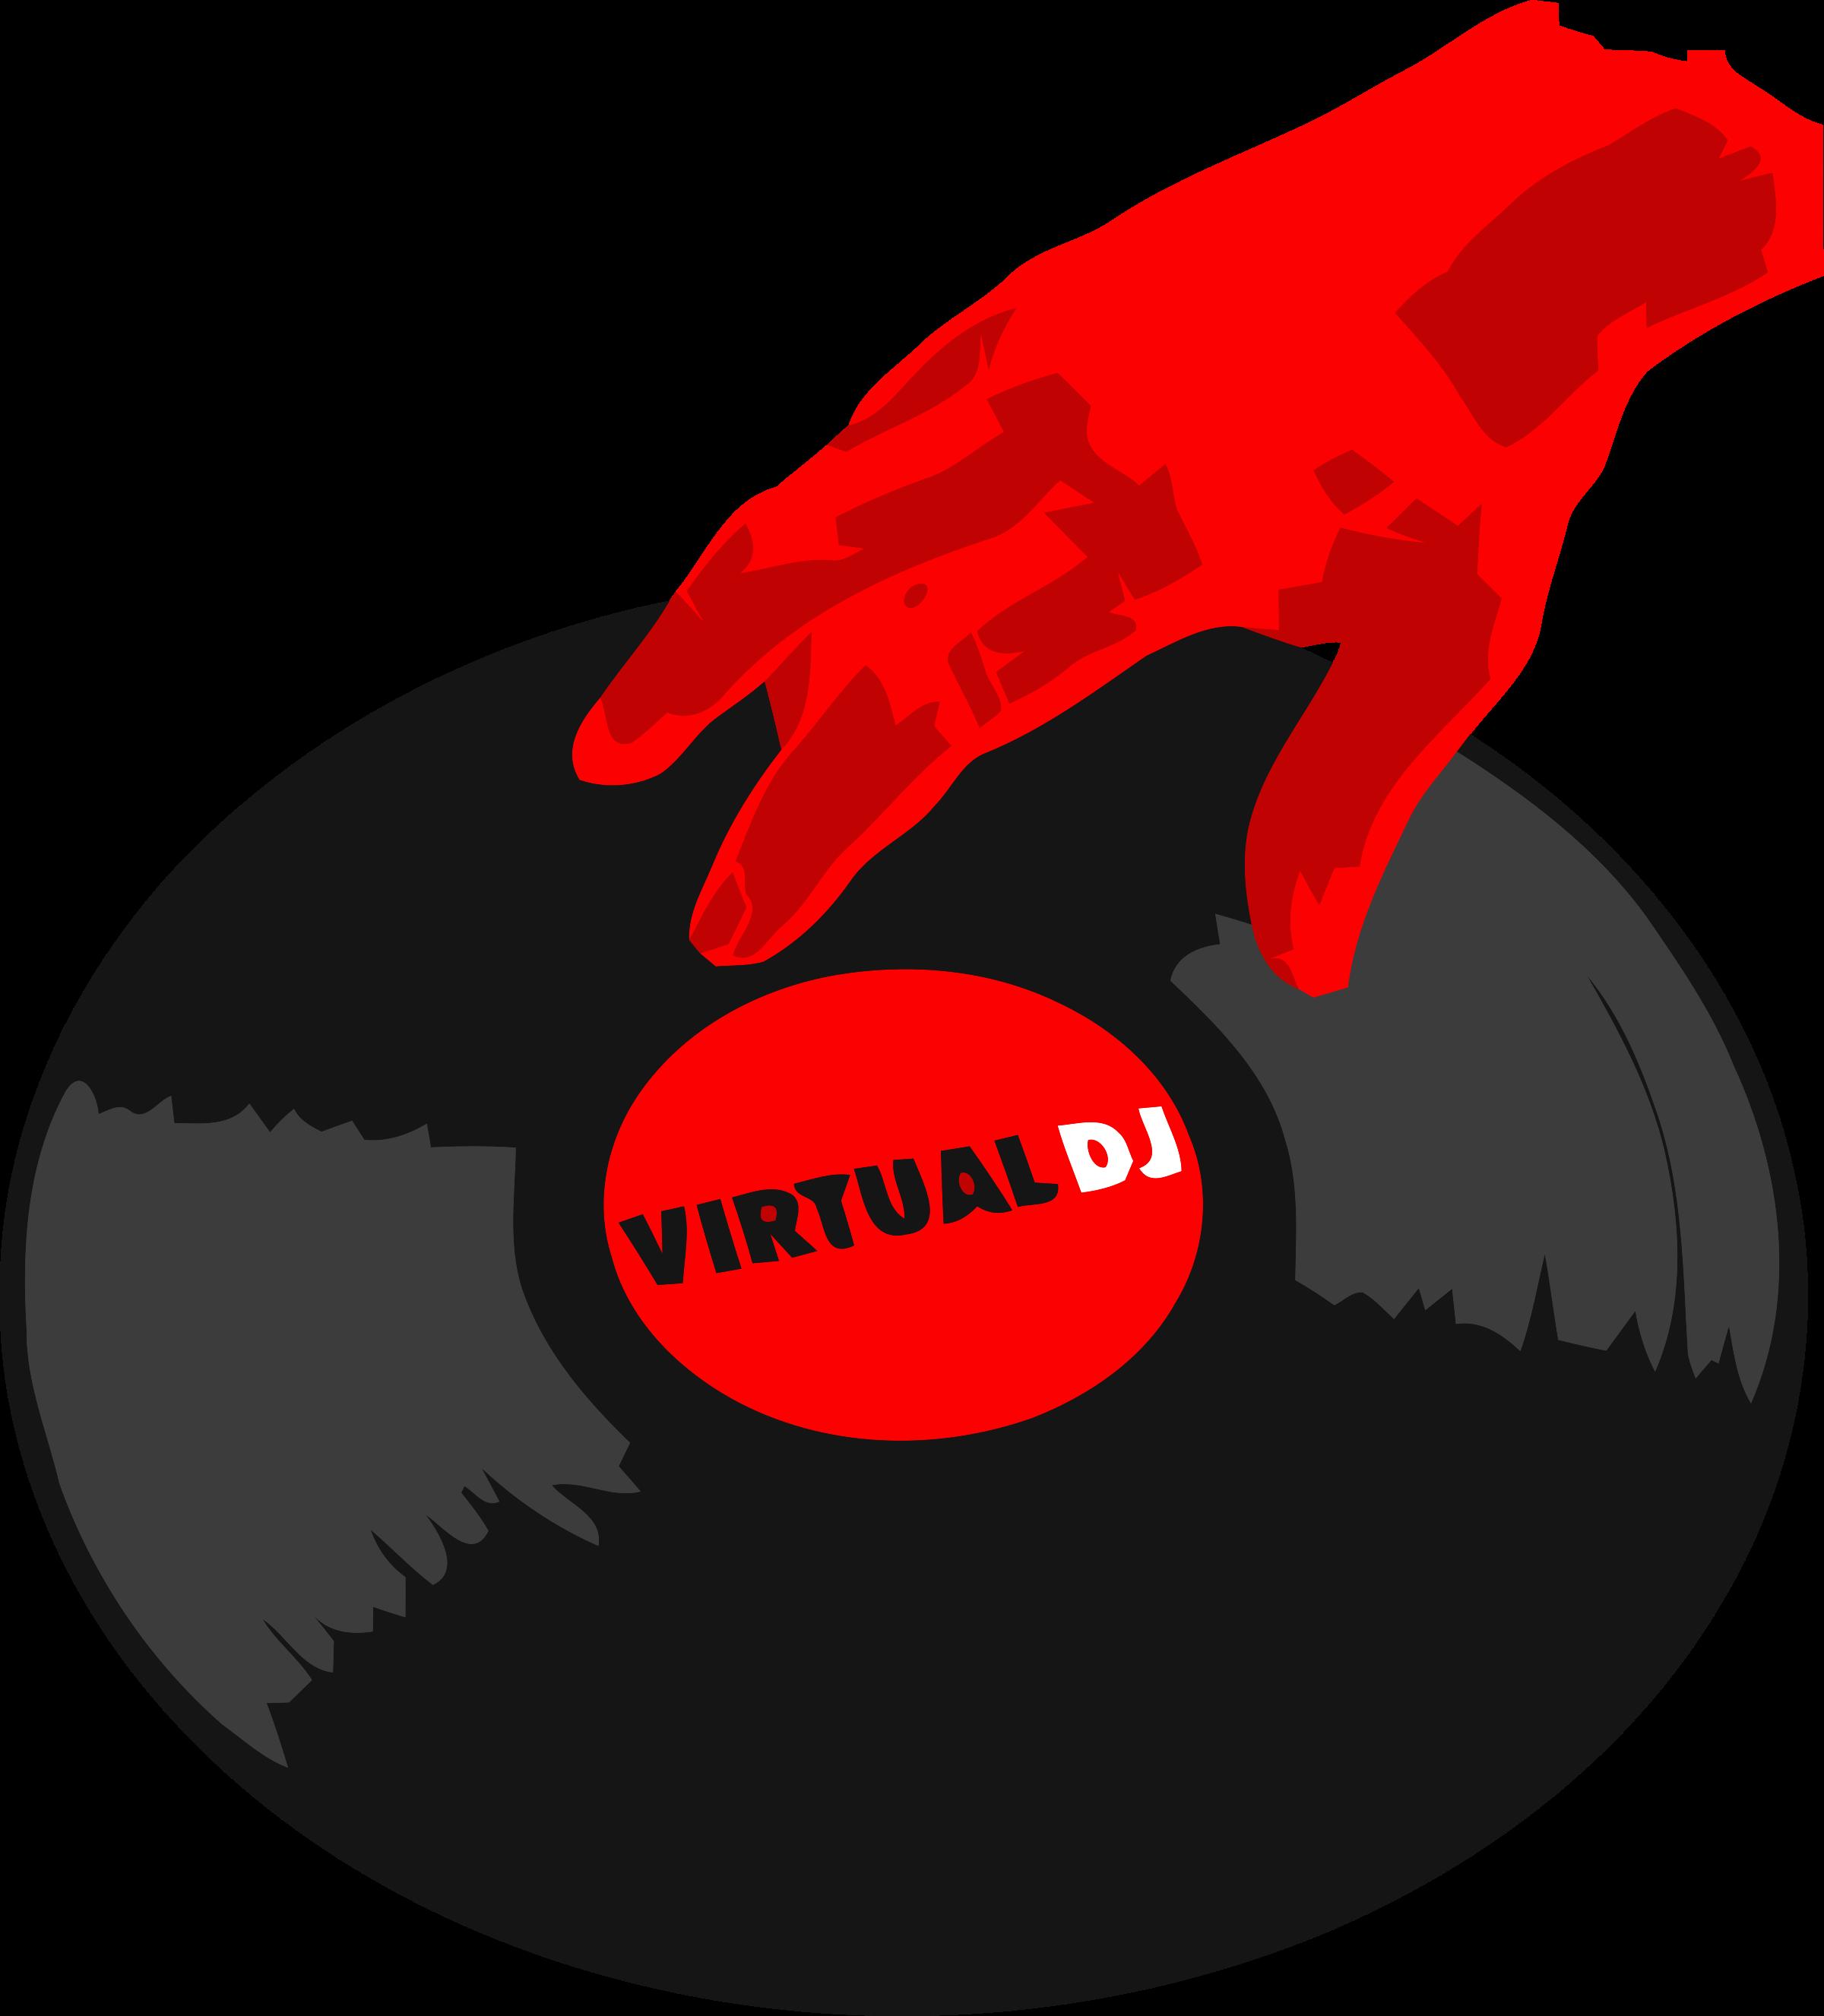 Dj clipart dj logo. Virtual png transparent svg